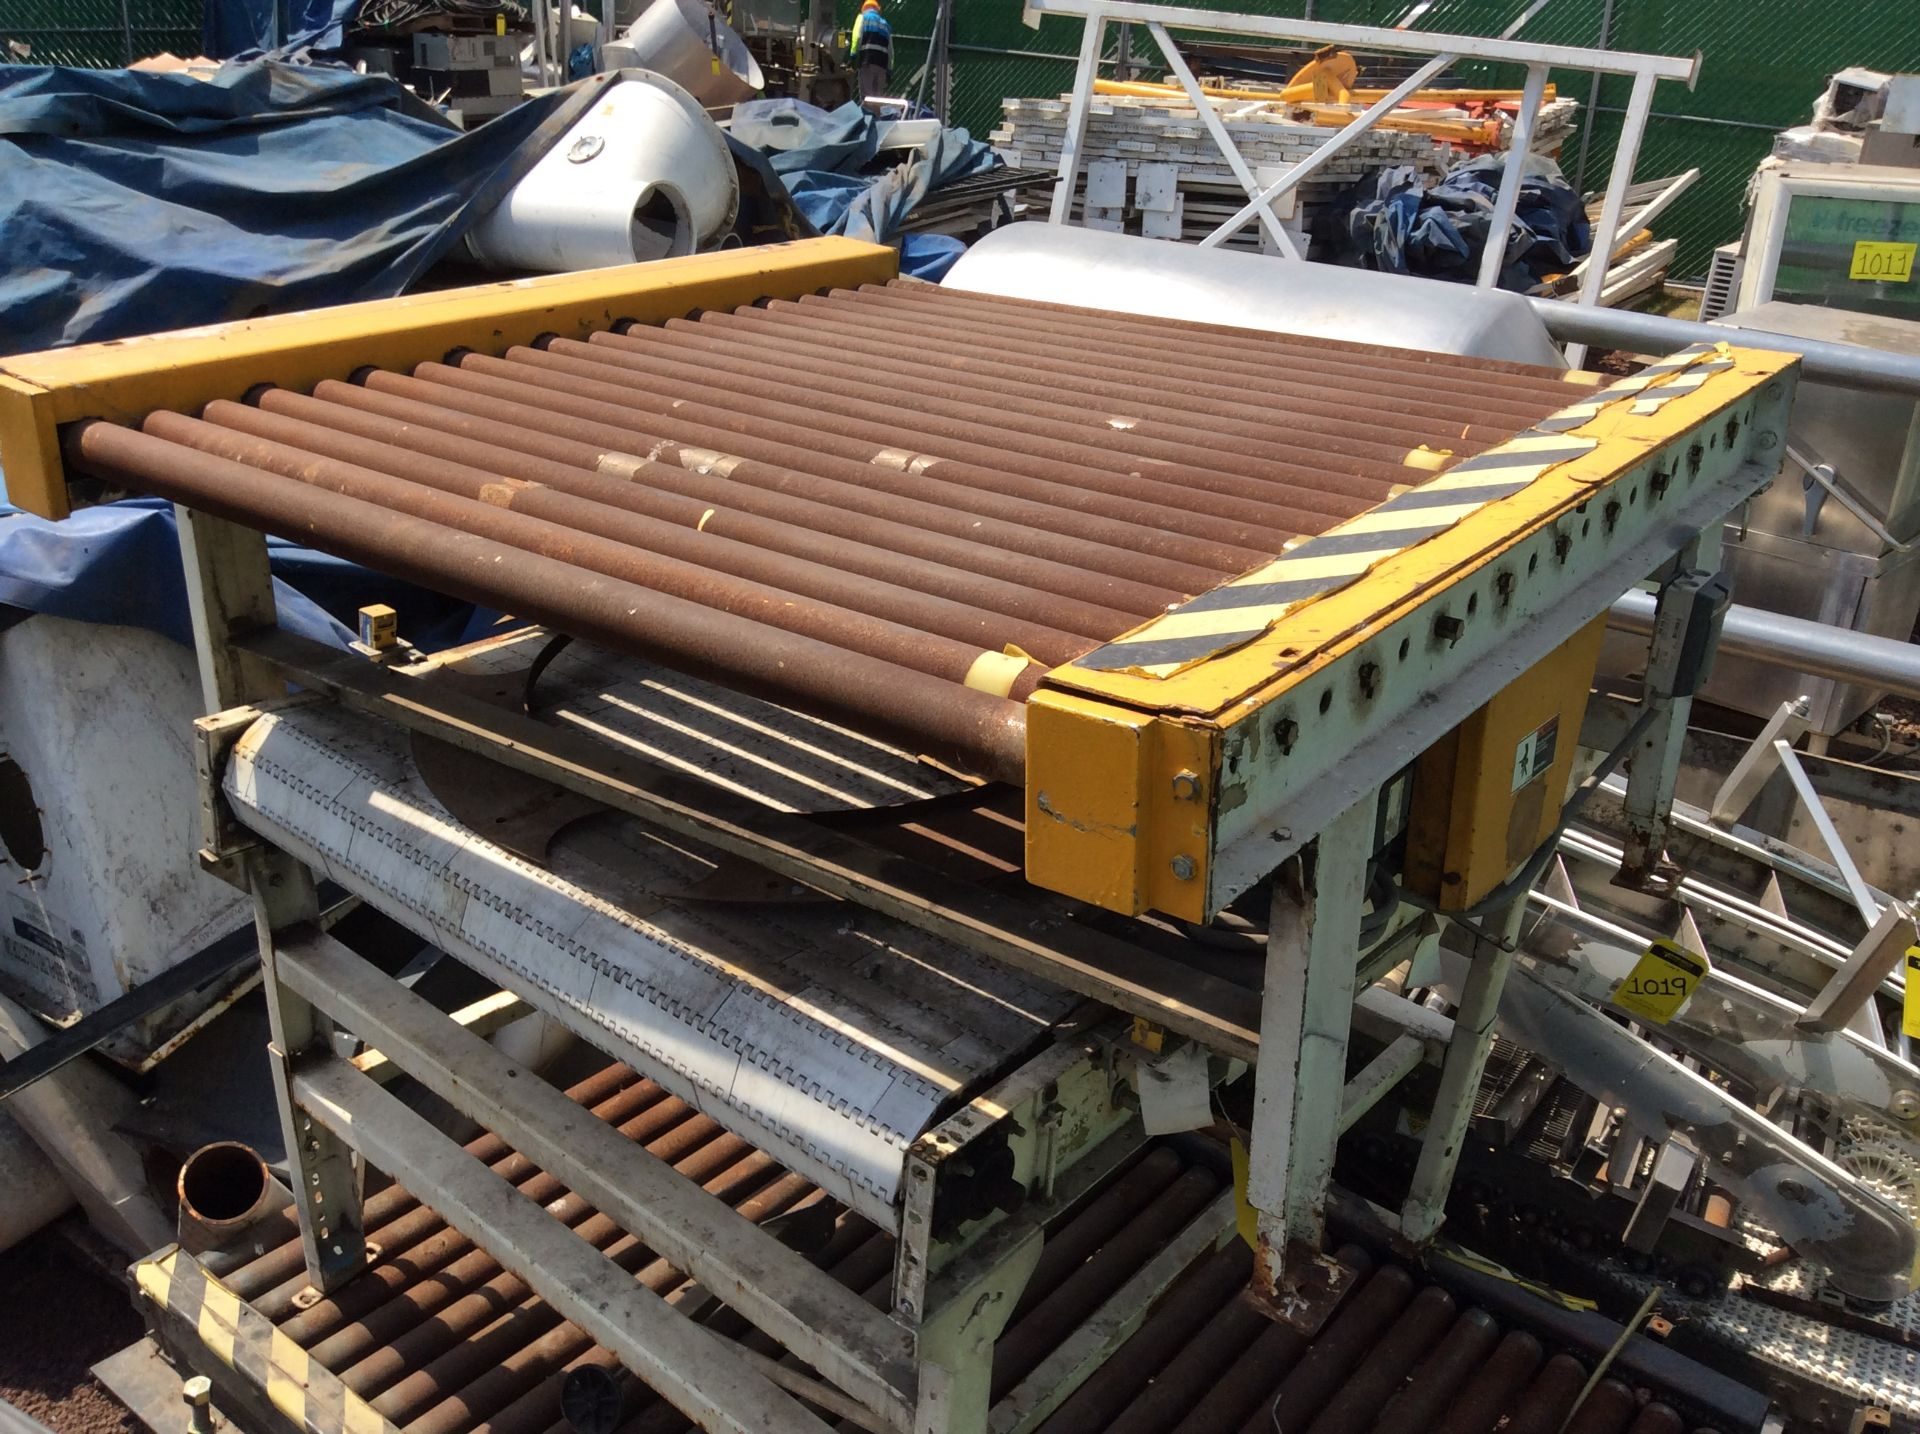 1 Roller conveyor, measures 1.37 x 1.50 x .67, 1 Conveyor measures 1.20 x 2.08x .65 - Image 4 of 8